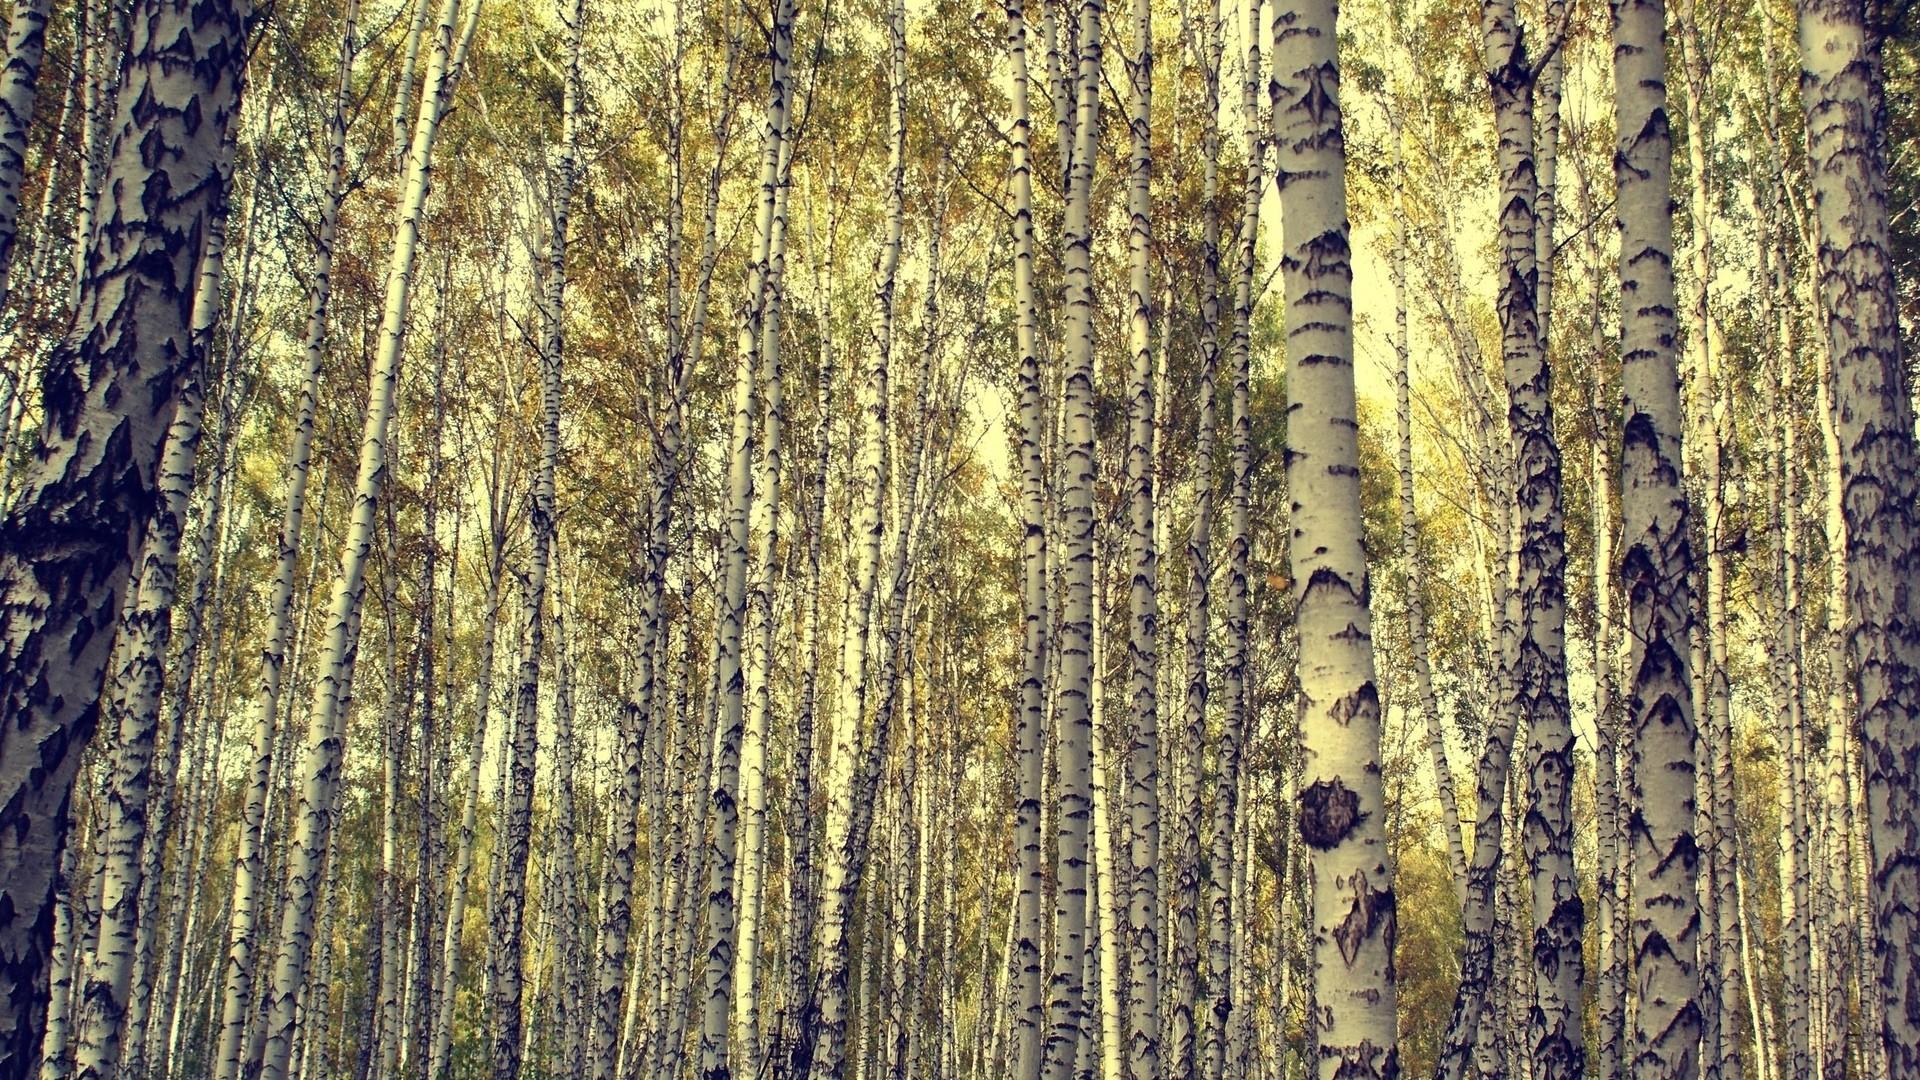 Birch Tree hd wallpaper download